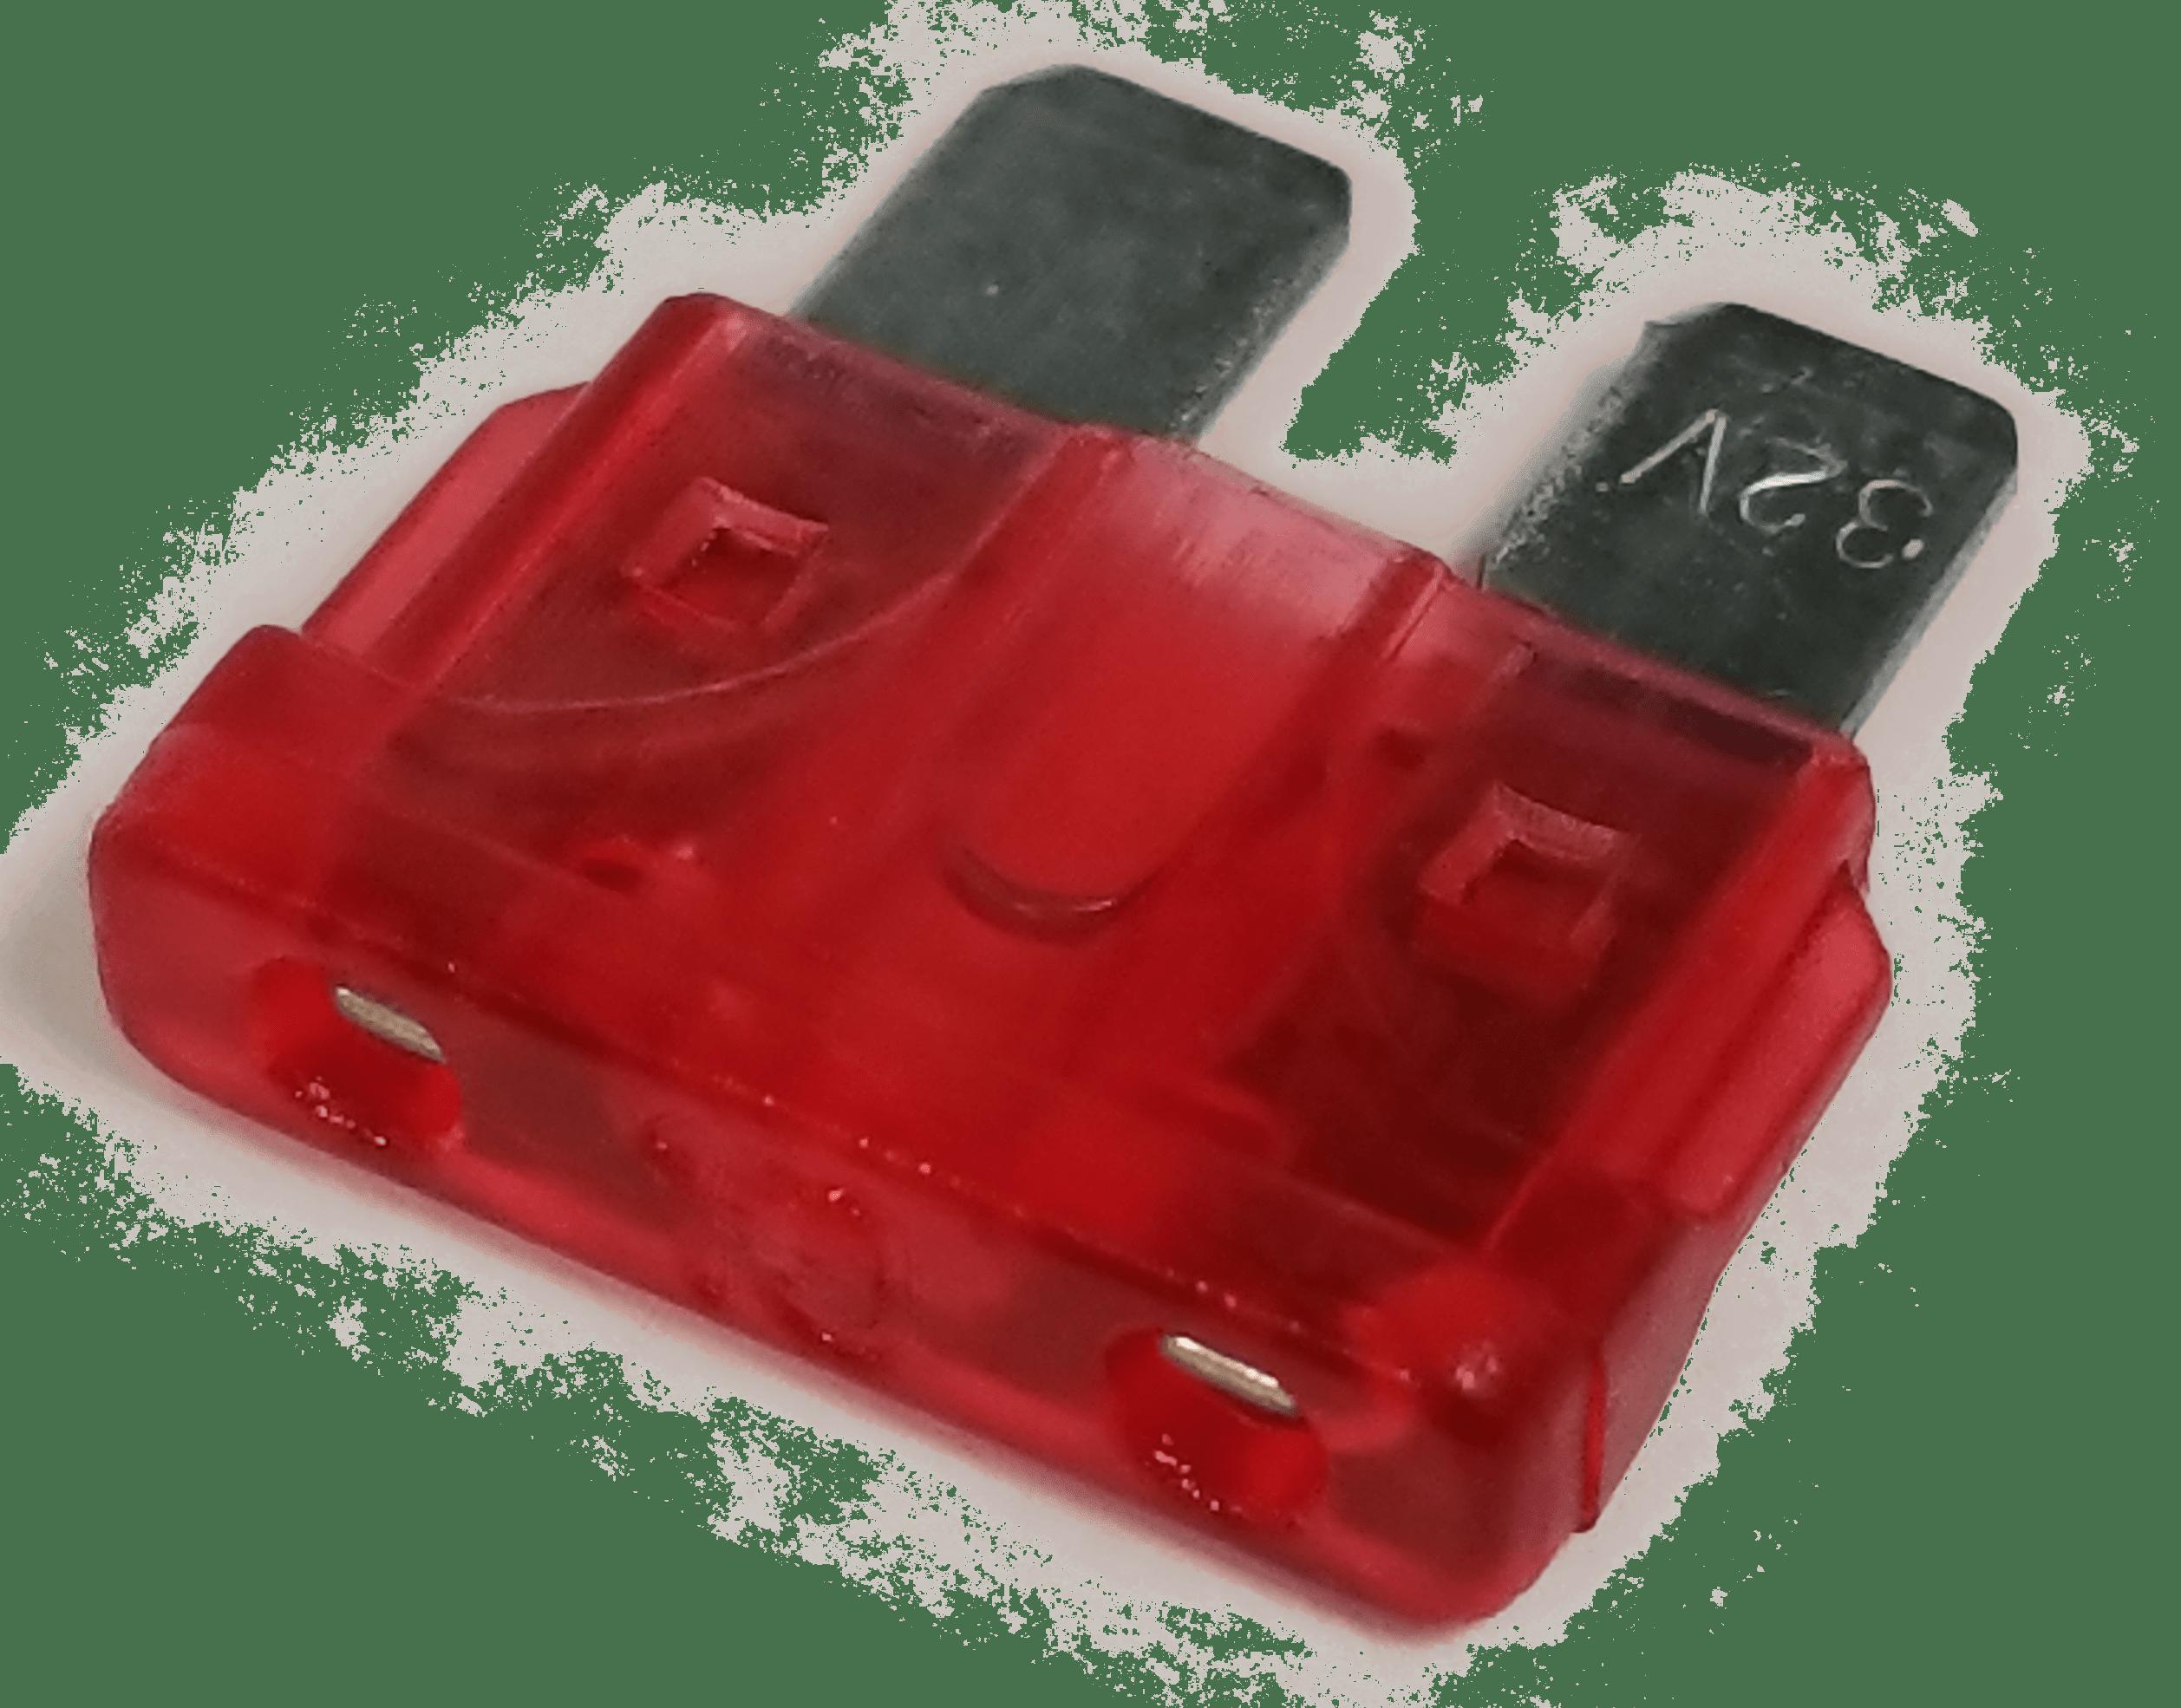 FATC10X - Marmat 10 Amp Blade Fuse (Bulk)